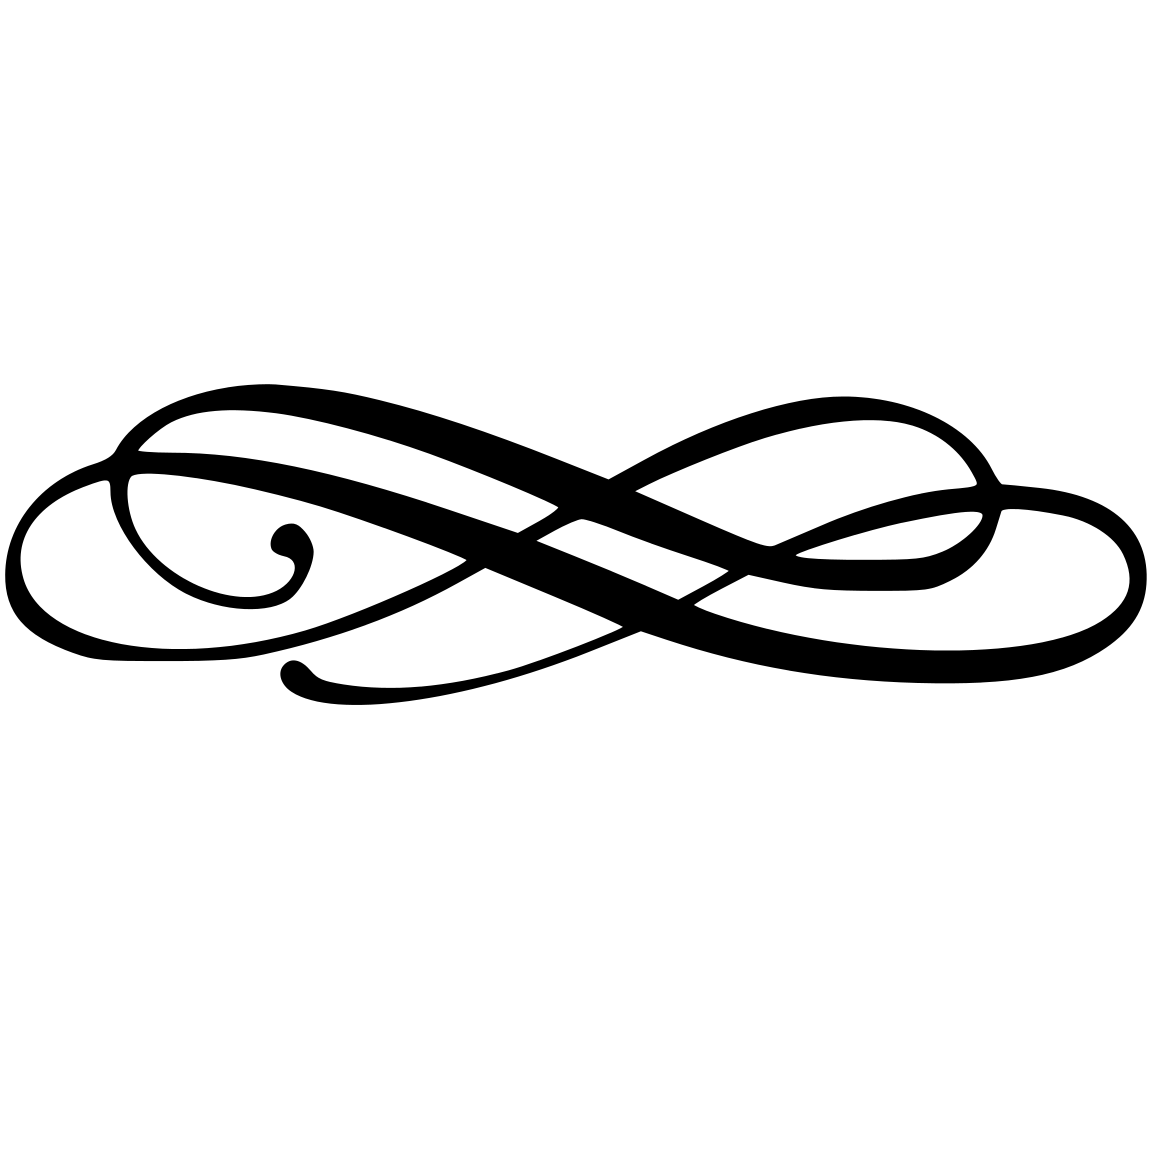 Free Flourish Clip Art, Download Free Clip Art, Free Clip.